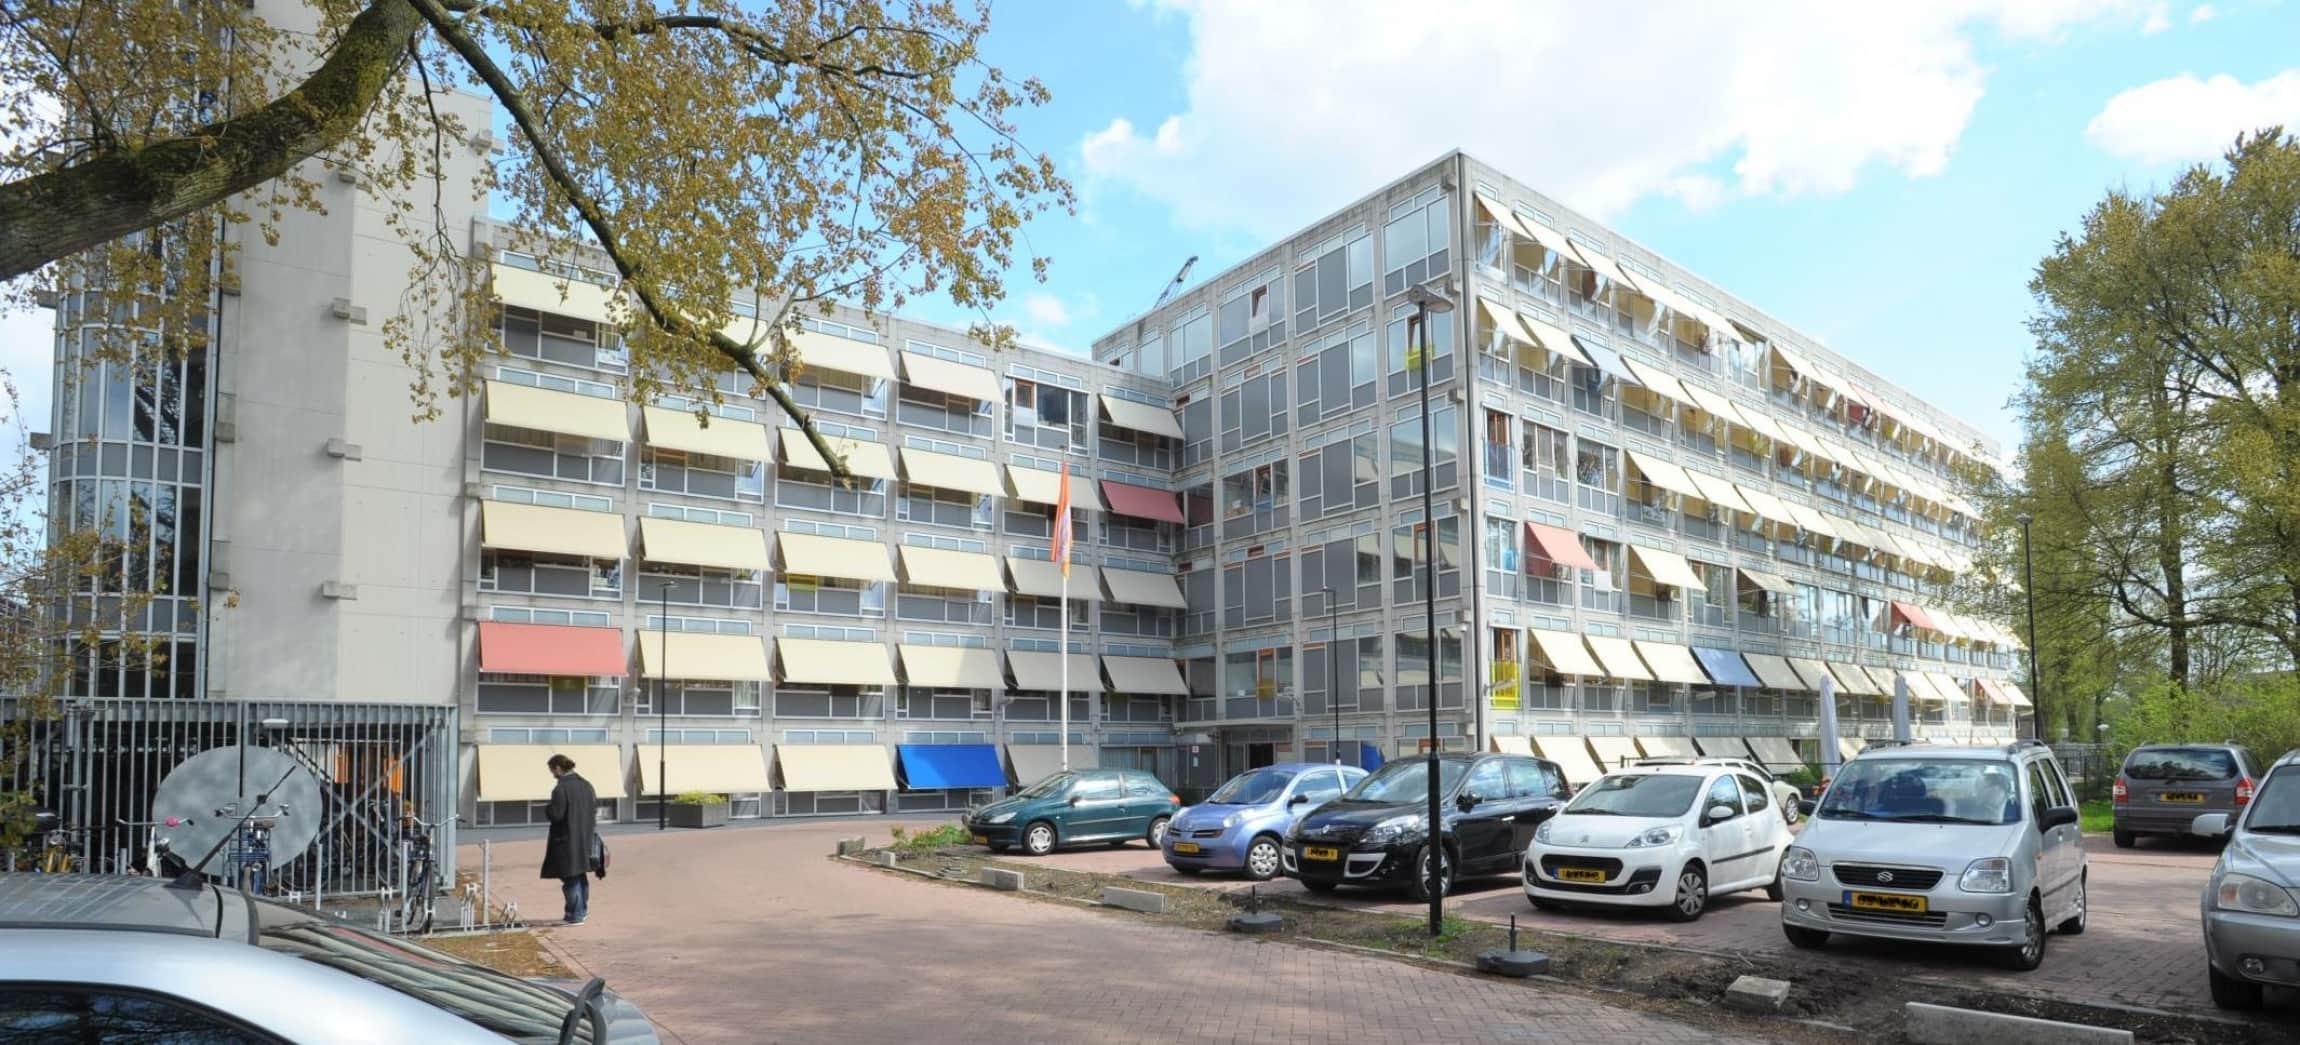 verzorgingshuis De Drie Hoven in Amsterdam